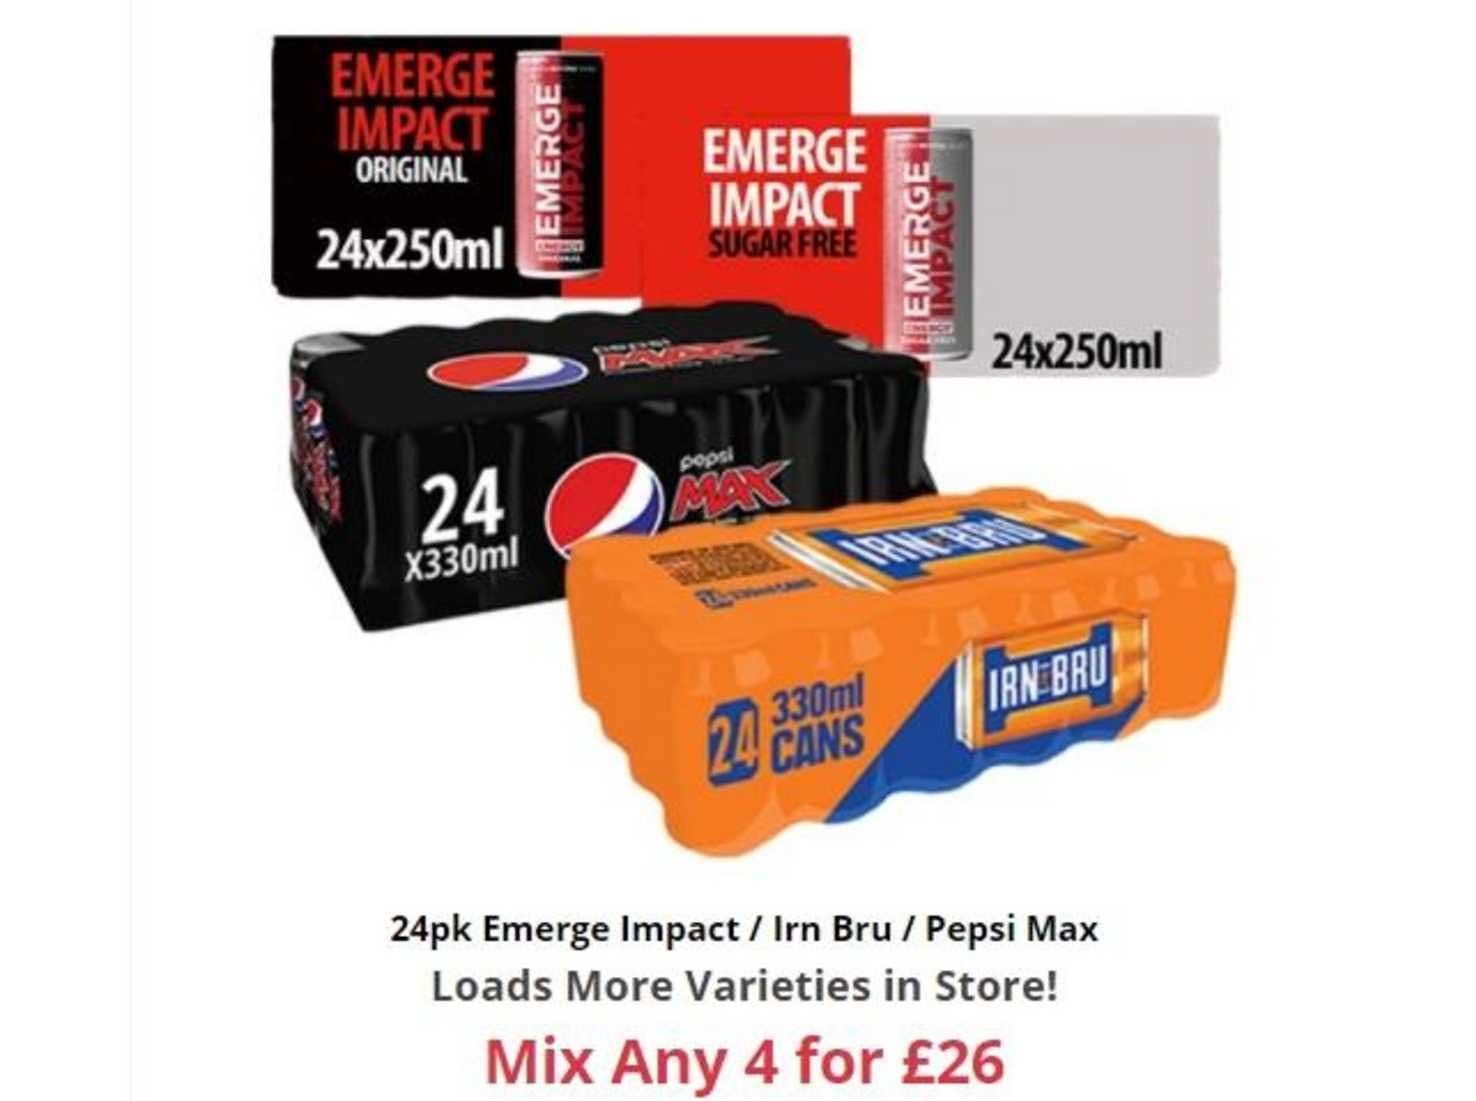 Farmfoods 24pk Emerge Impact - Irn Bru - Pepsi Max